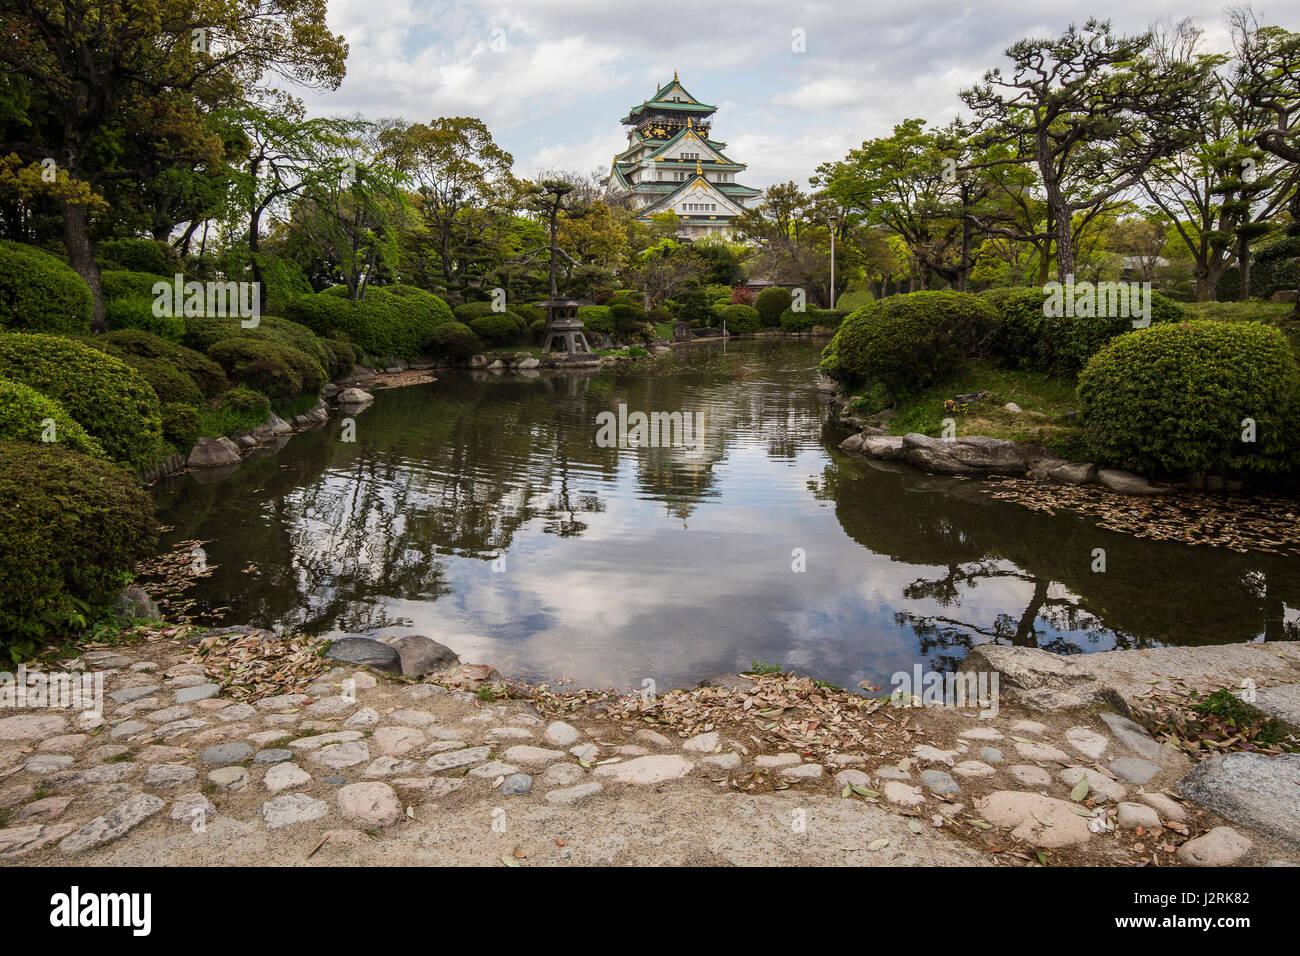 Osaka Castle Garden - the inner bailey garden was developed along ...